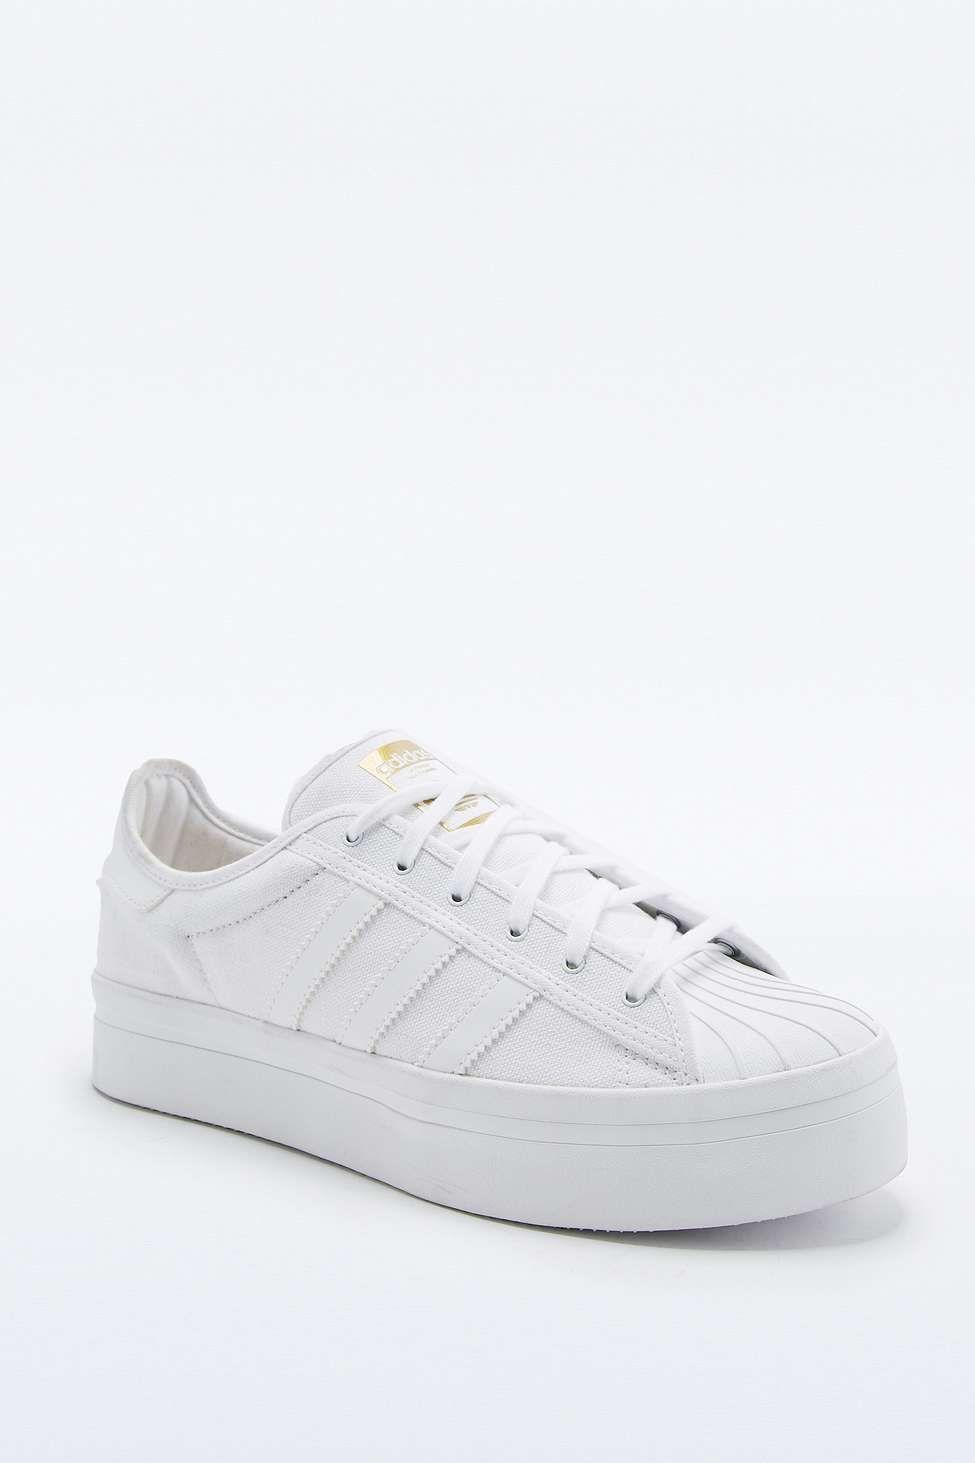 adidas Originals Superstar Rize White Sneakers